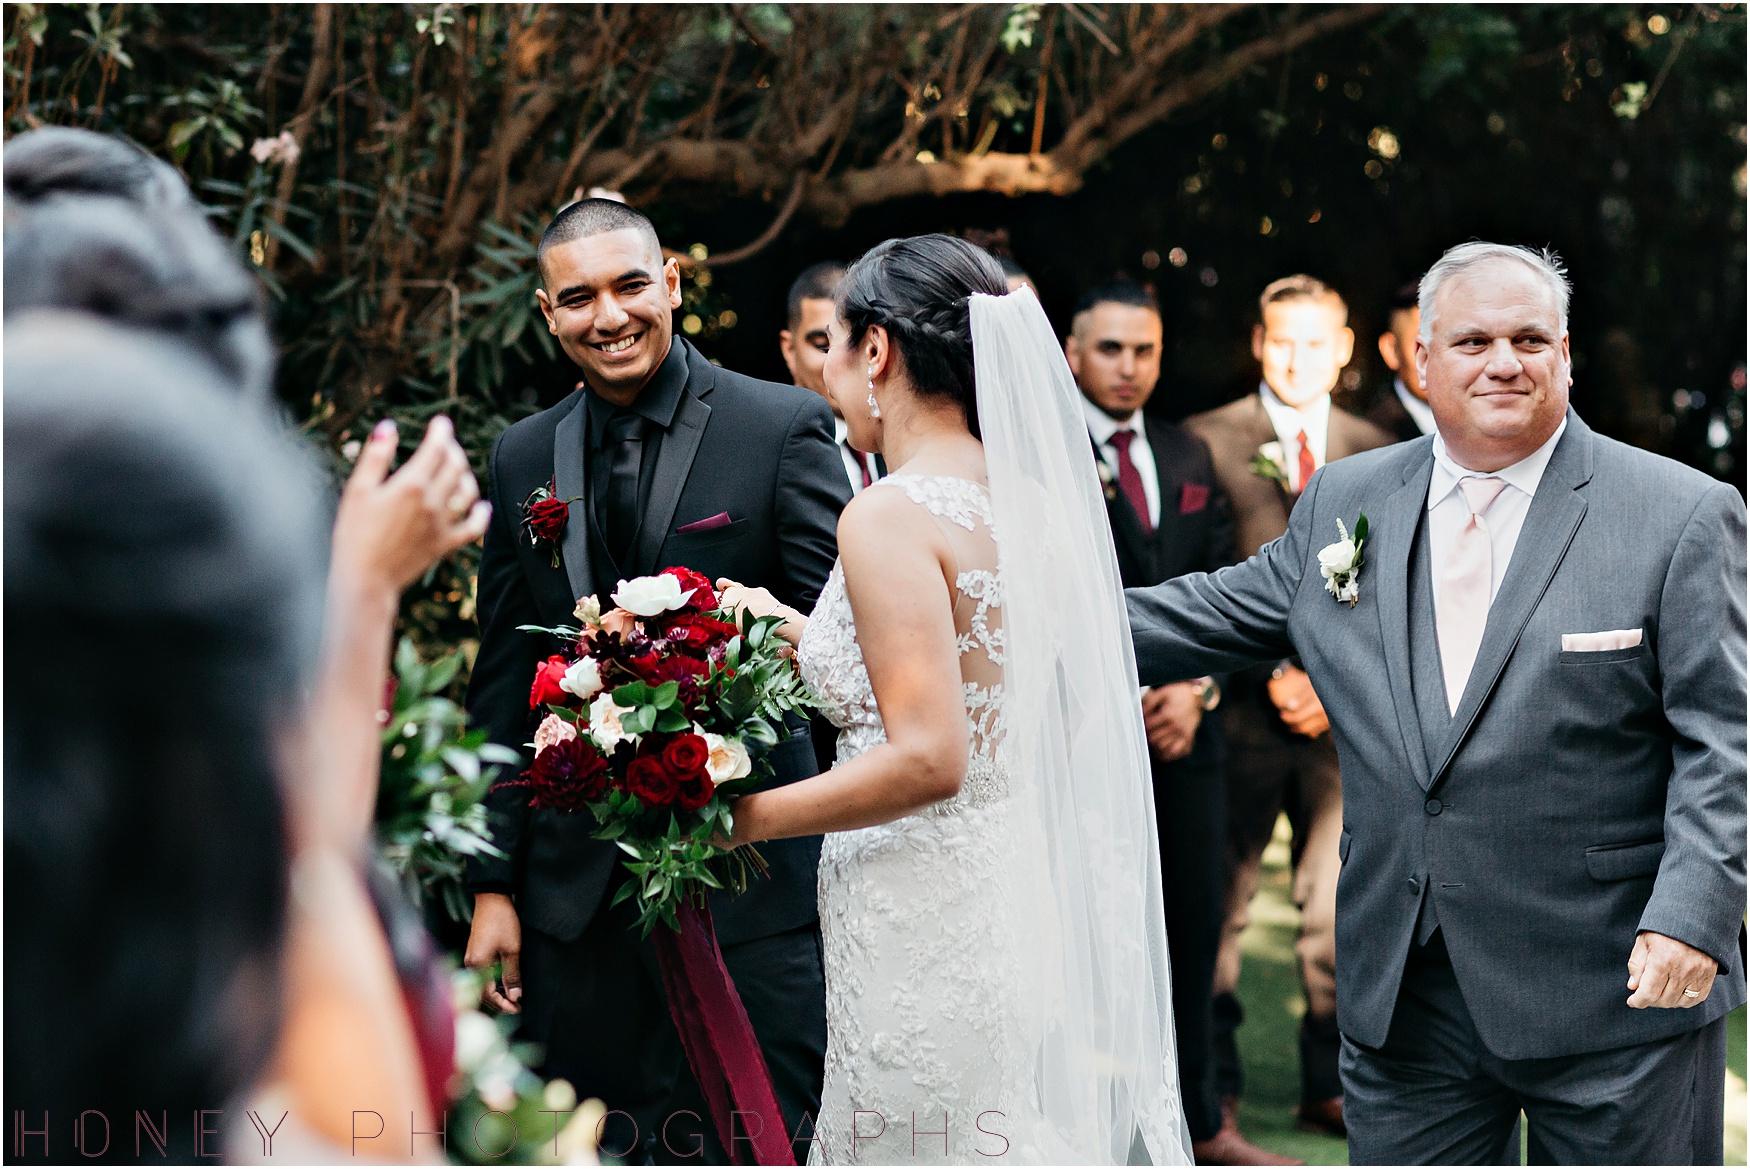 twin_oaks_garden_estate_fall_winter_burgundy_wedding018.jpg